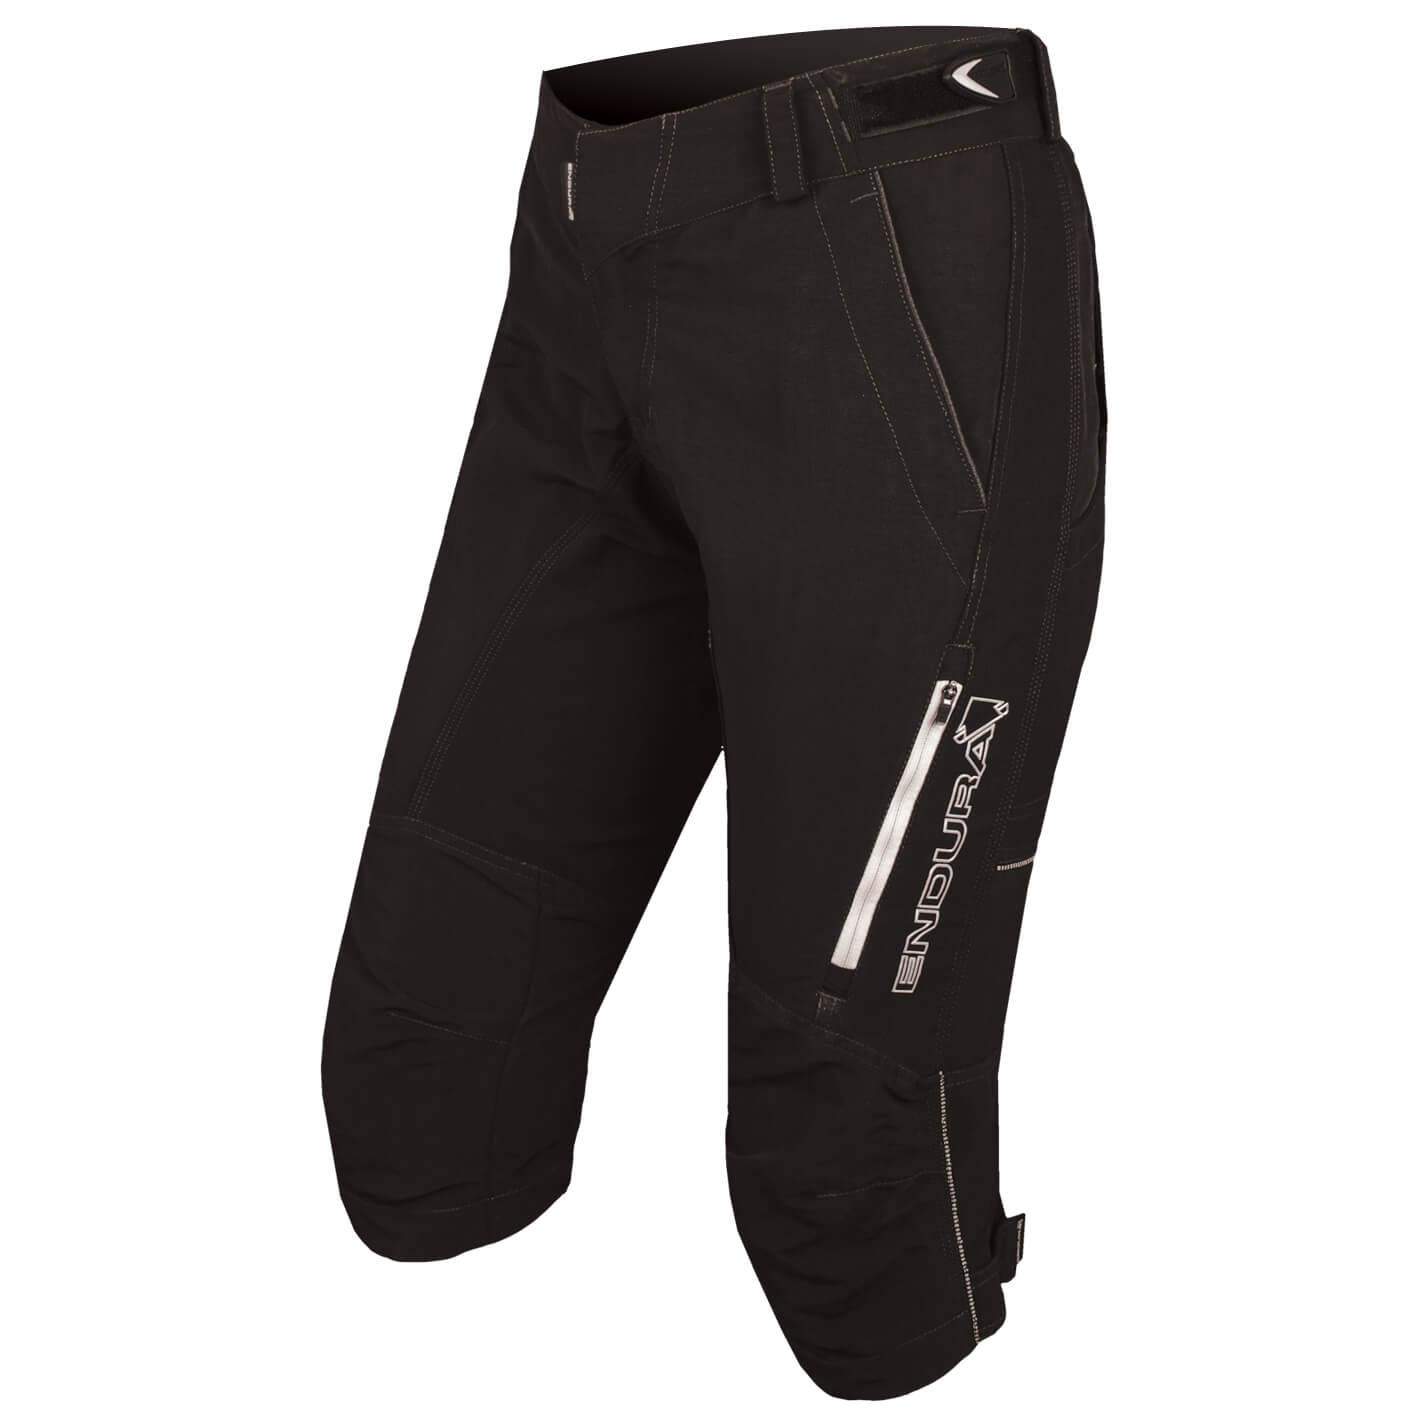 Endura SingleTrack II 34 Hose Cykelbukser Dame køb online